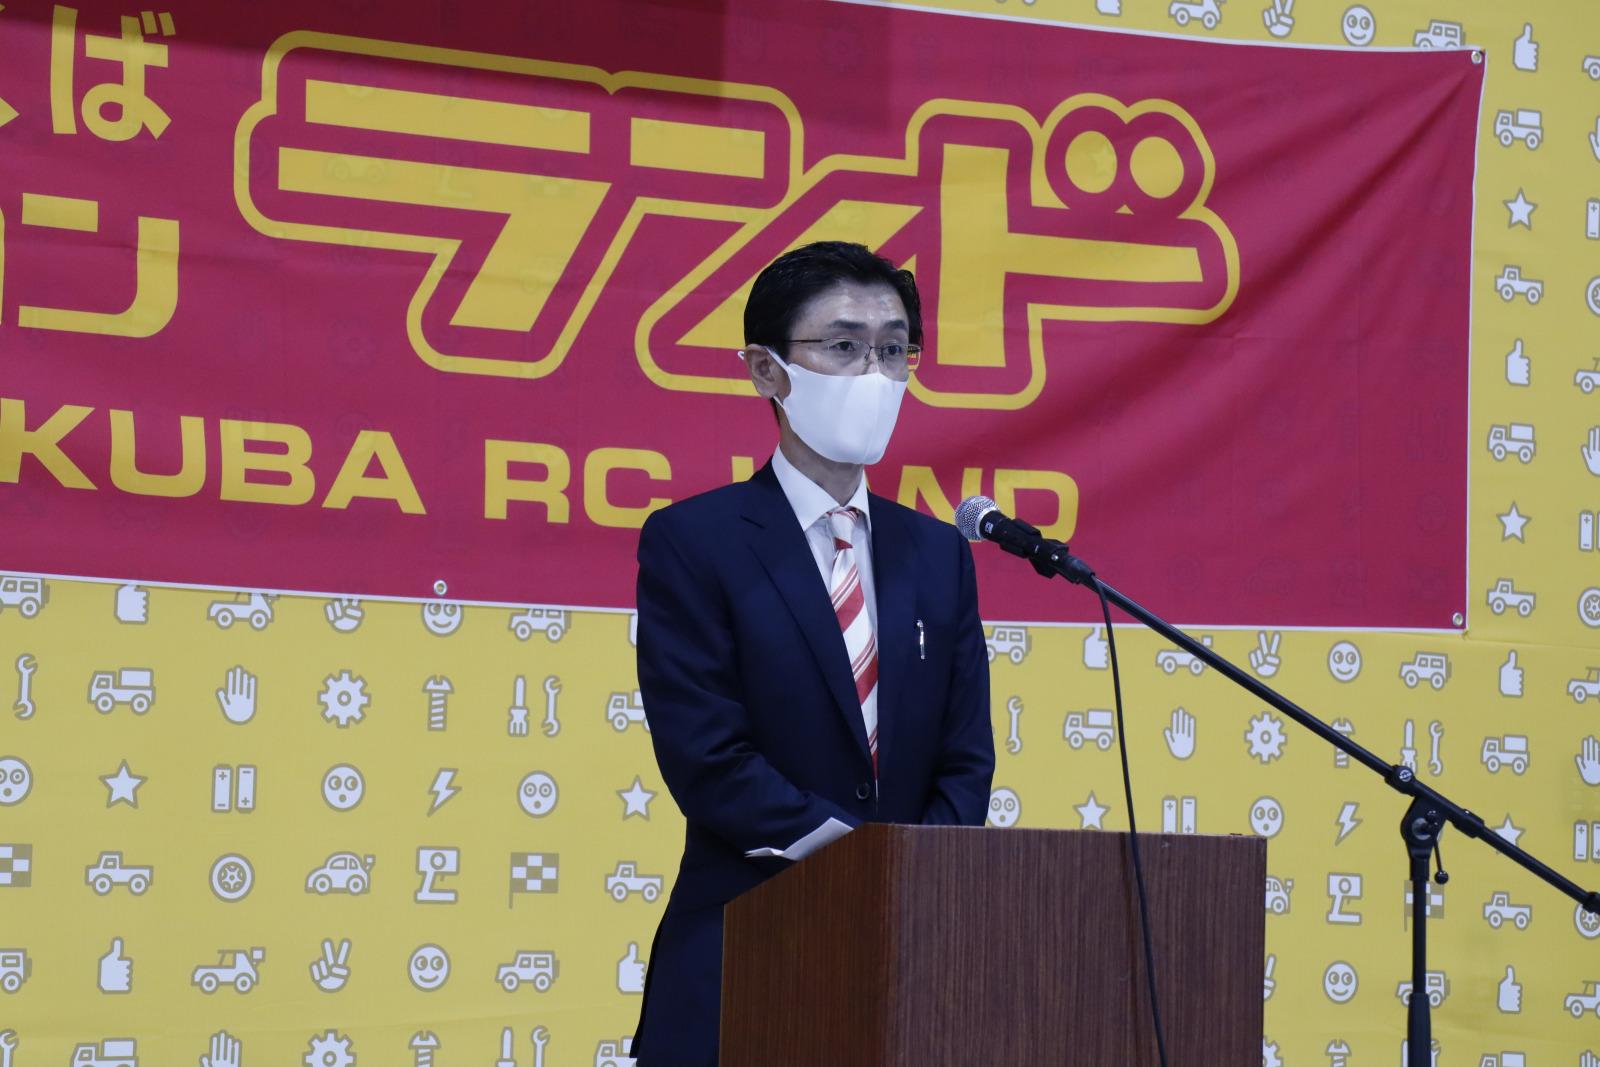 鈴木茂樹ヨコモ代表取締役社長。